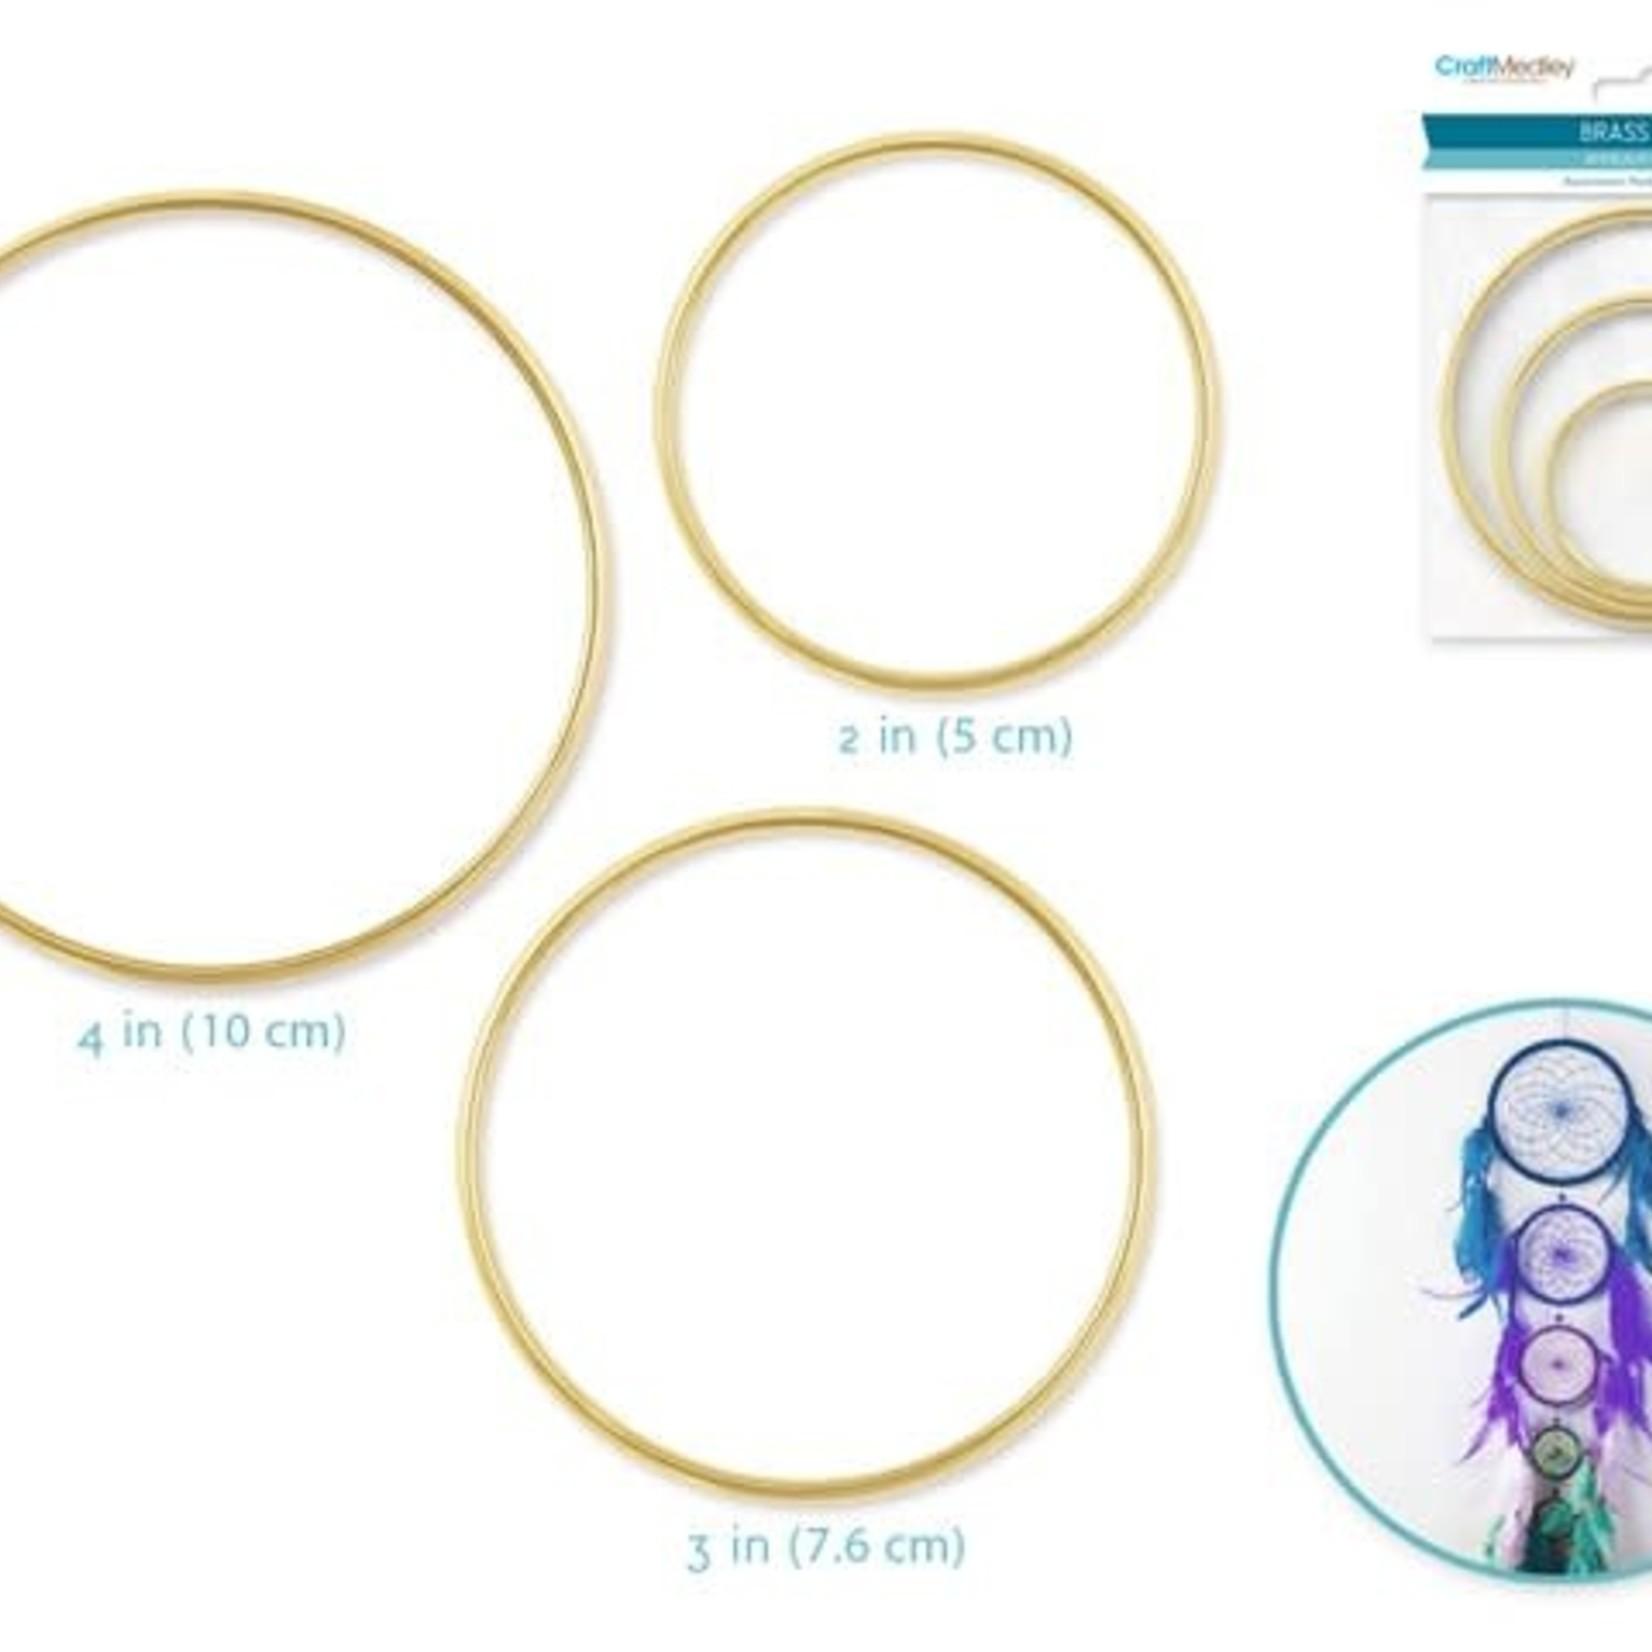 Brass Rings: Assortment Pack x3 (2''+3''+4'')